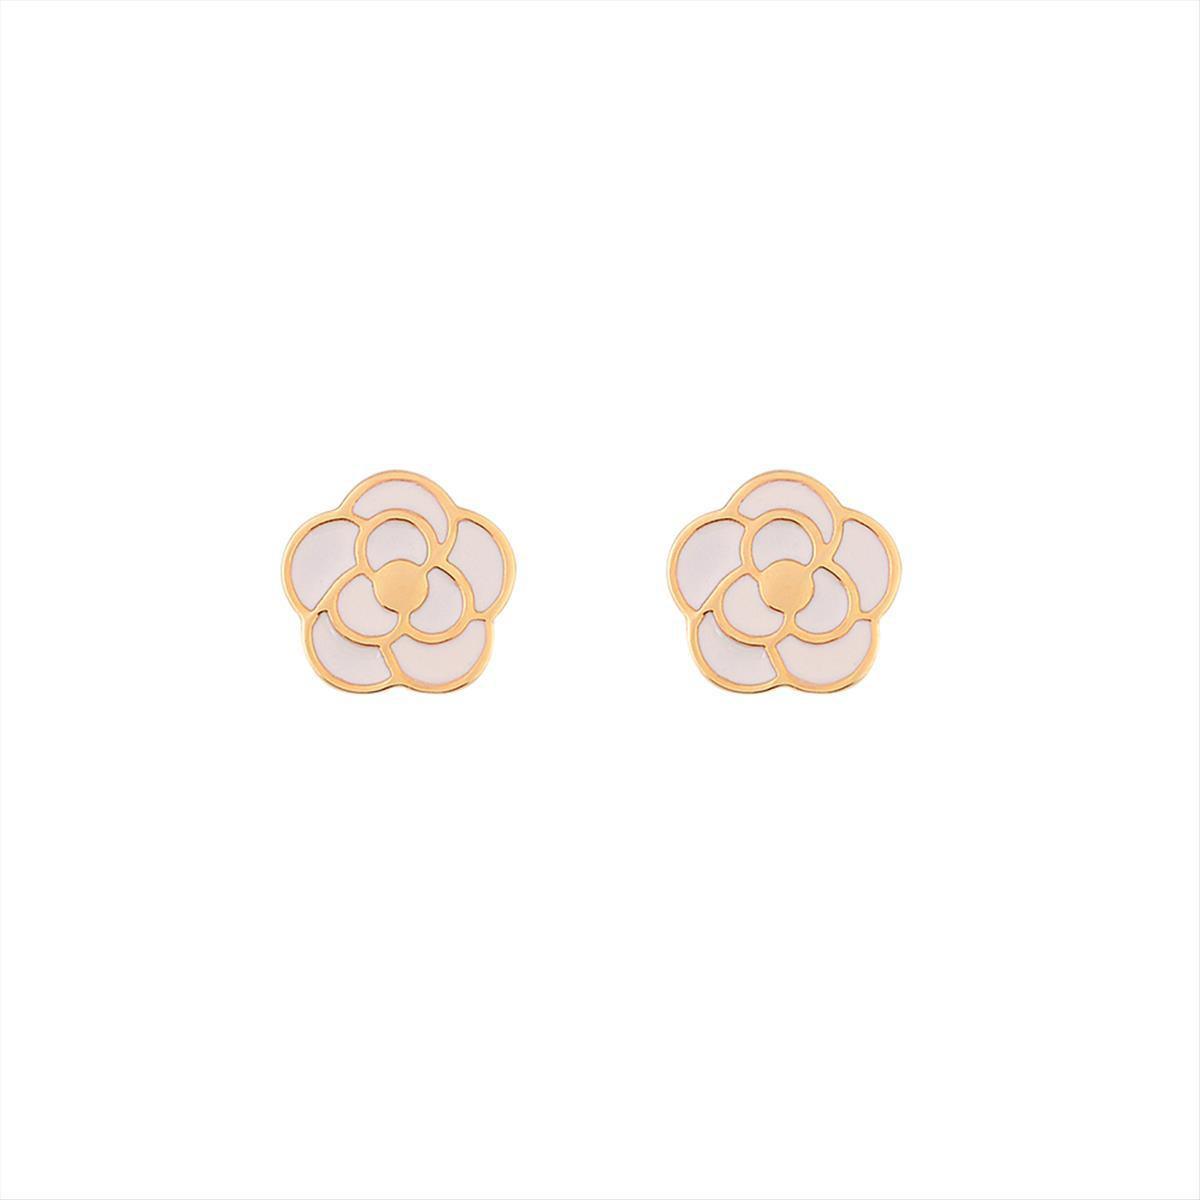 Boucles d'oreilles Edforce - 201-0120-E - Modalova